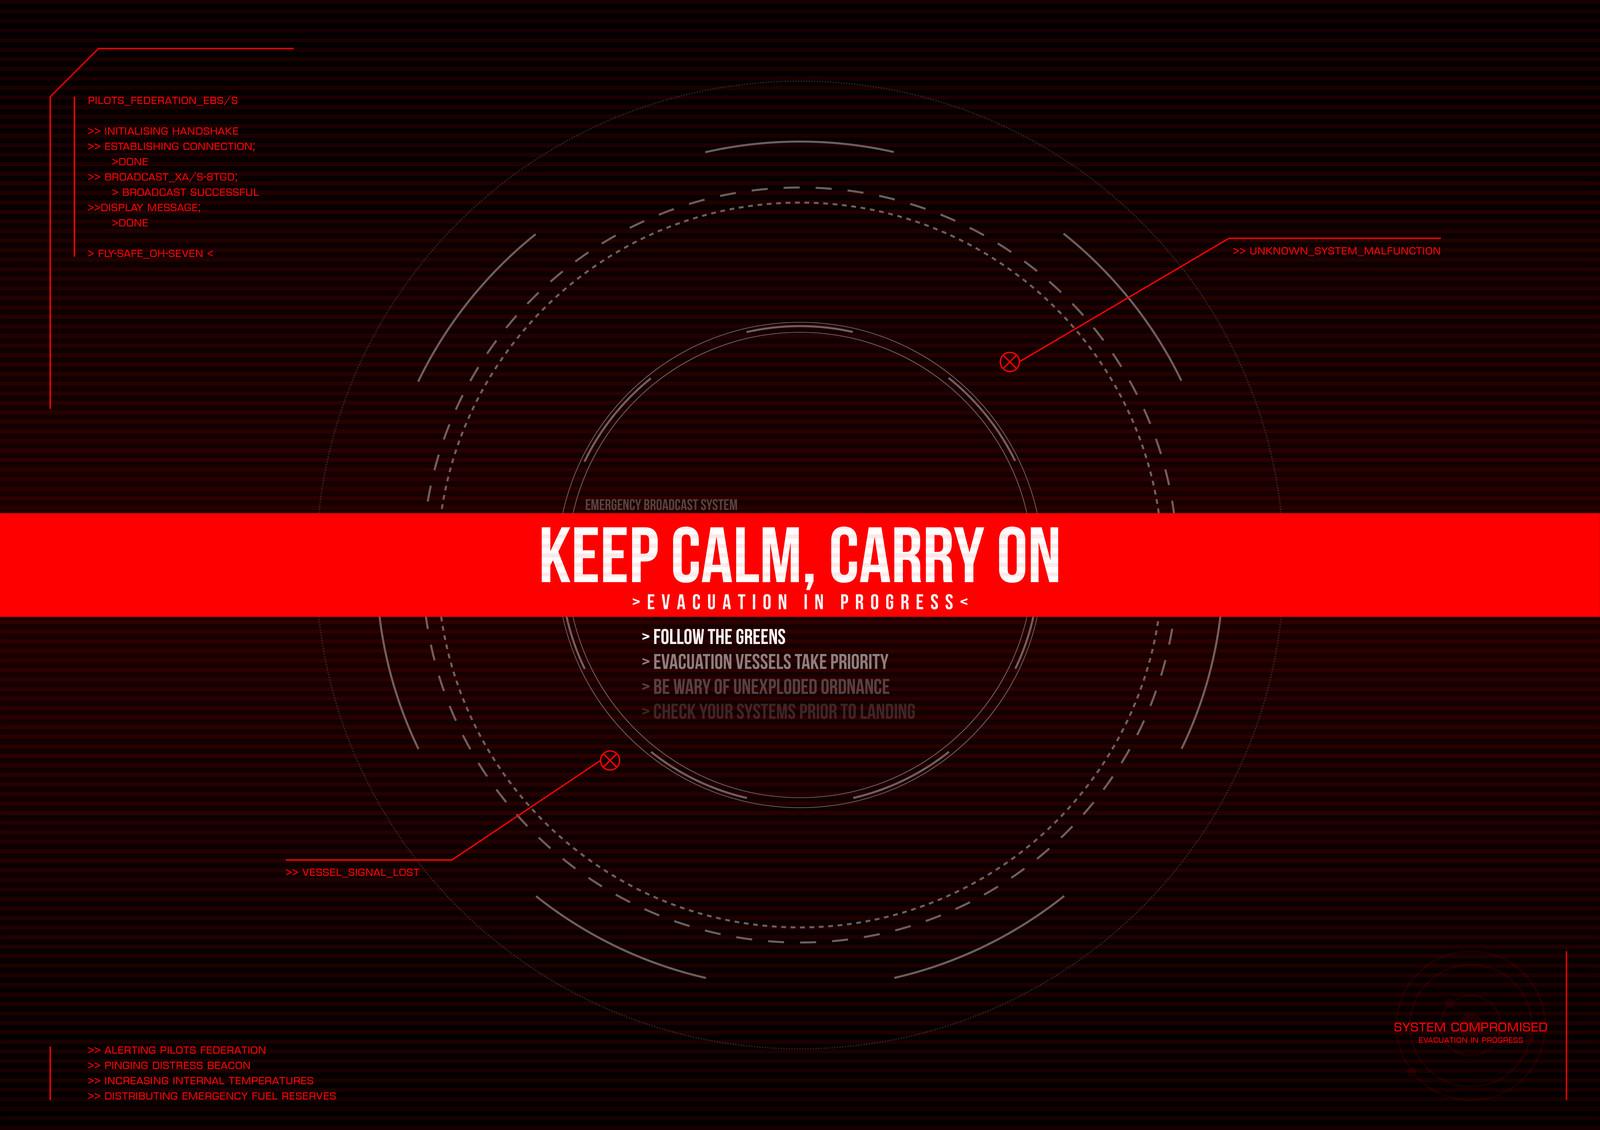 Pilots Federation: Emergency Broadcast System